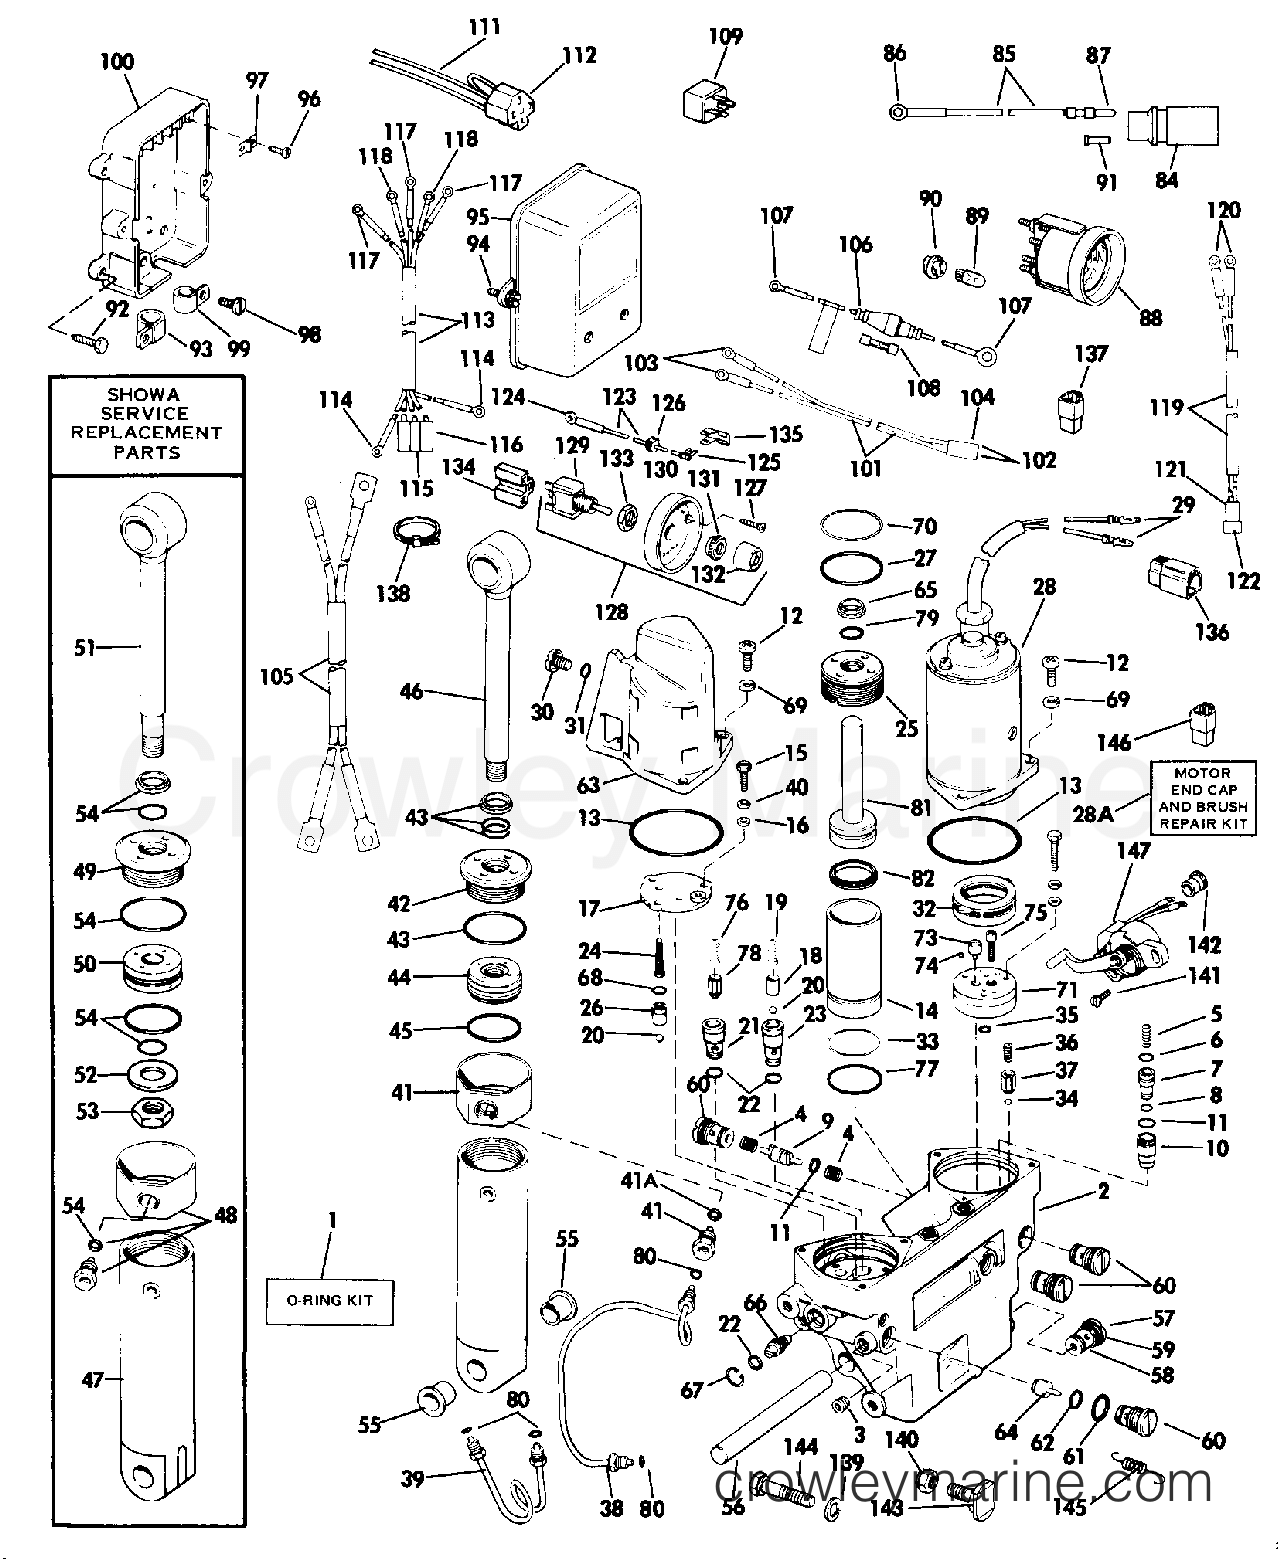 1984 Rigging Parts Accessories - Power Trim & Tilt - POWER TRIM/TILT 65 THRU V-6